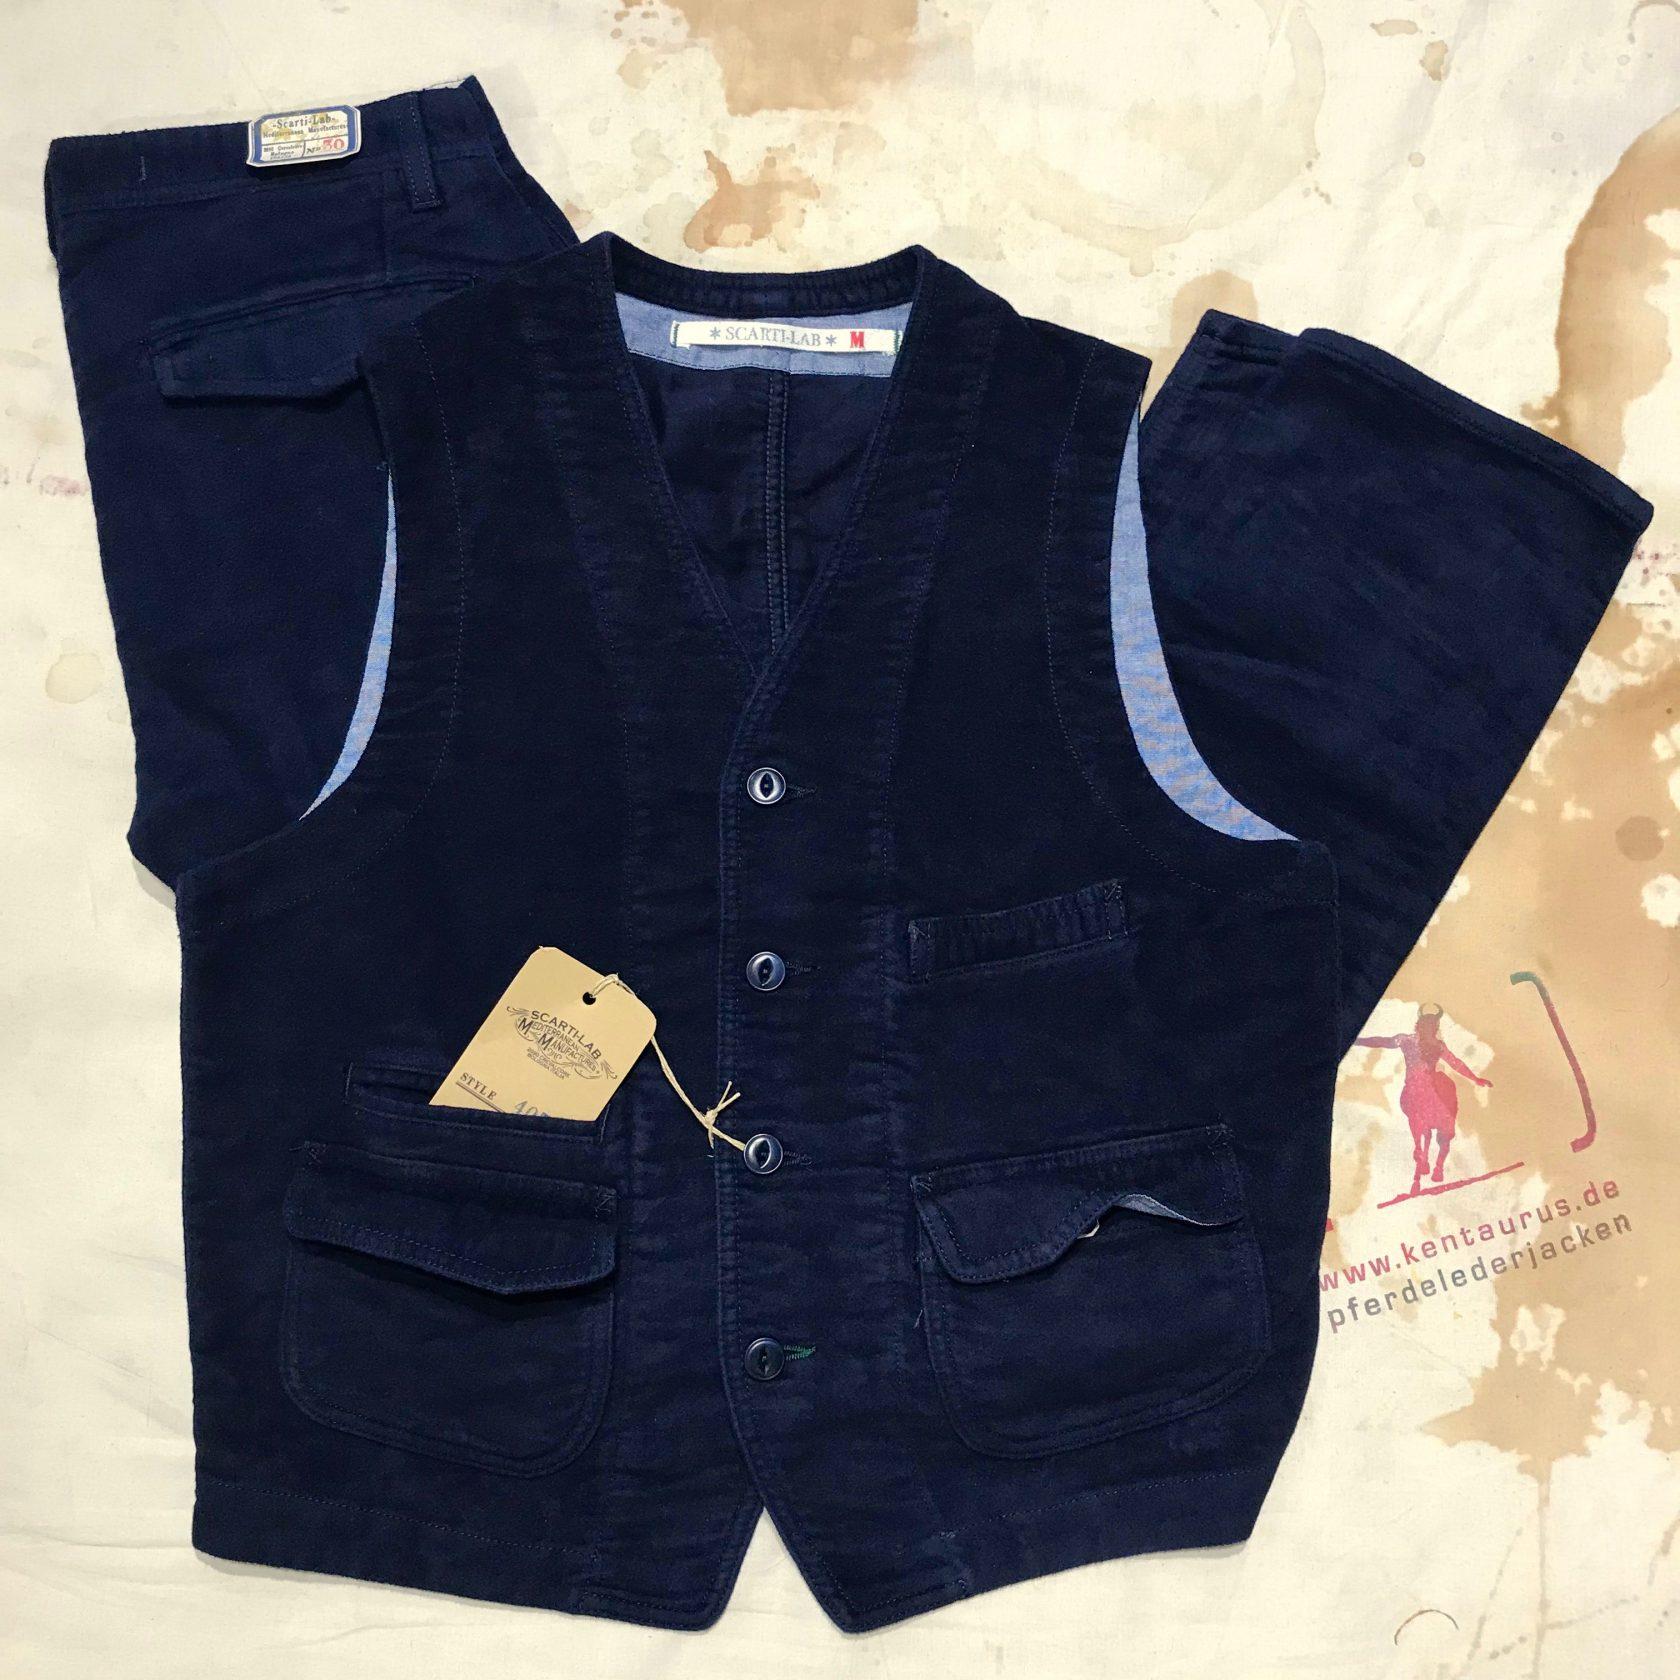 Scartilab moleskin vest and pant